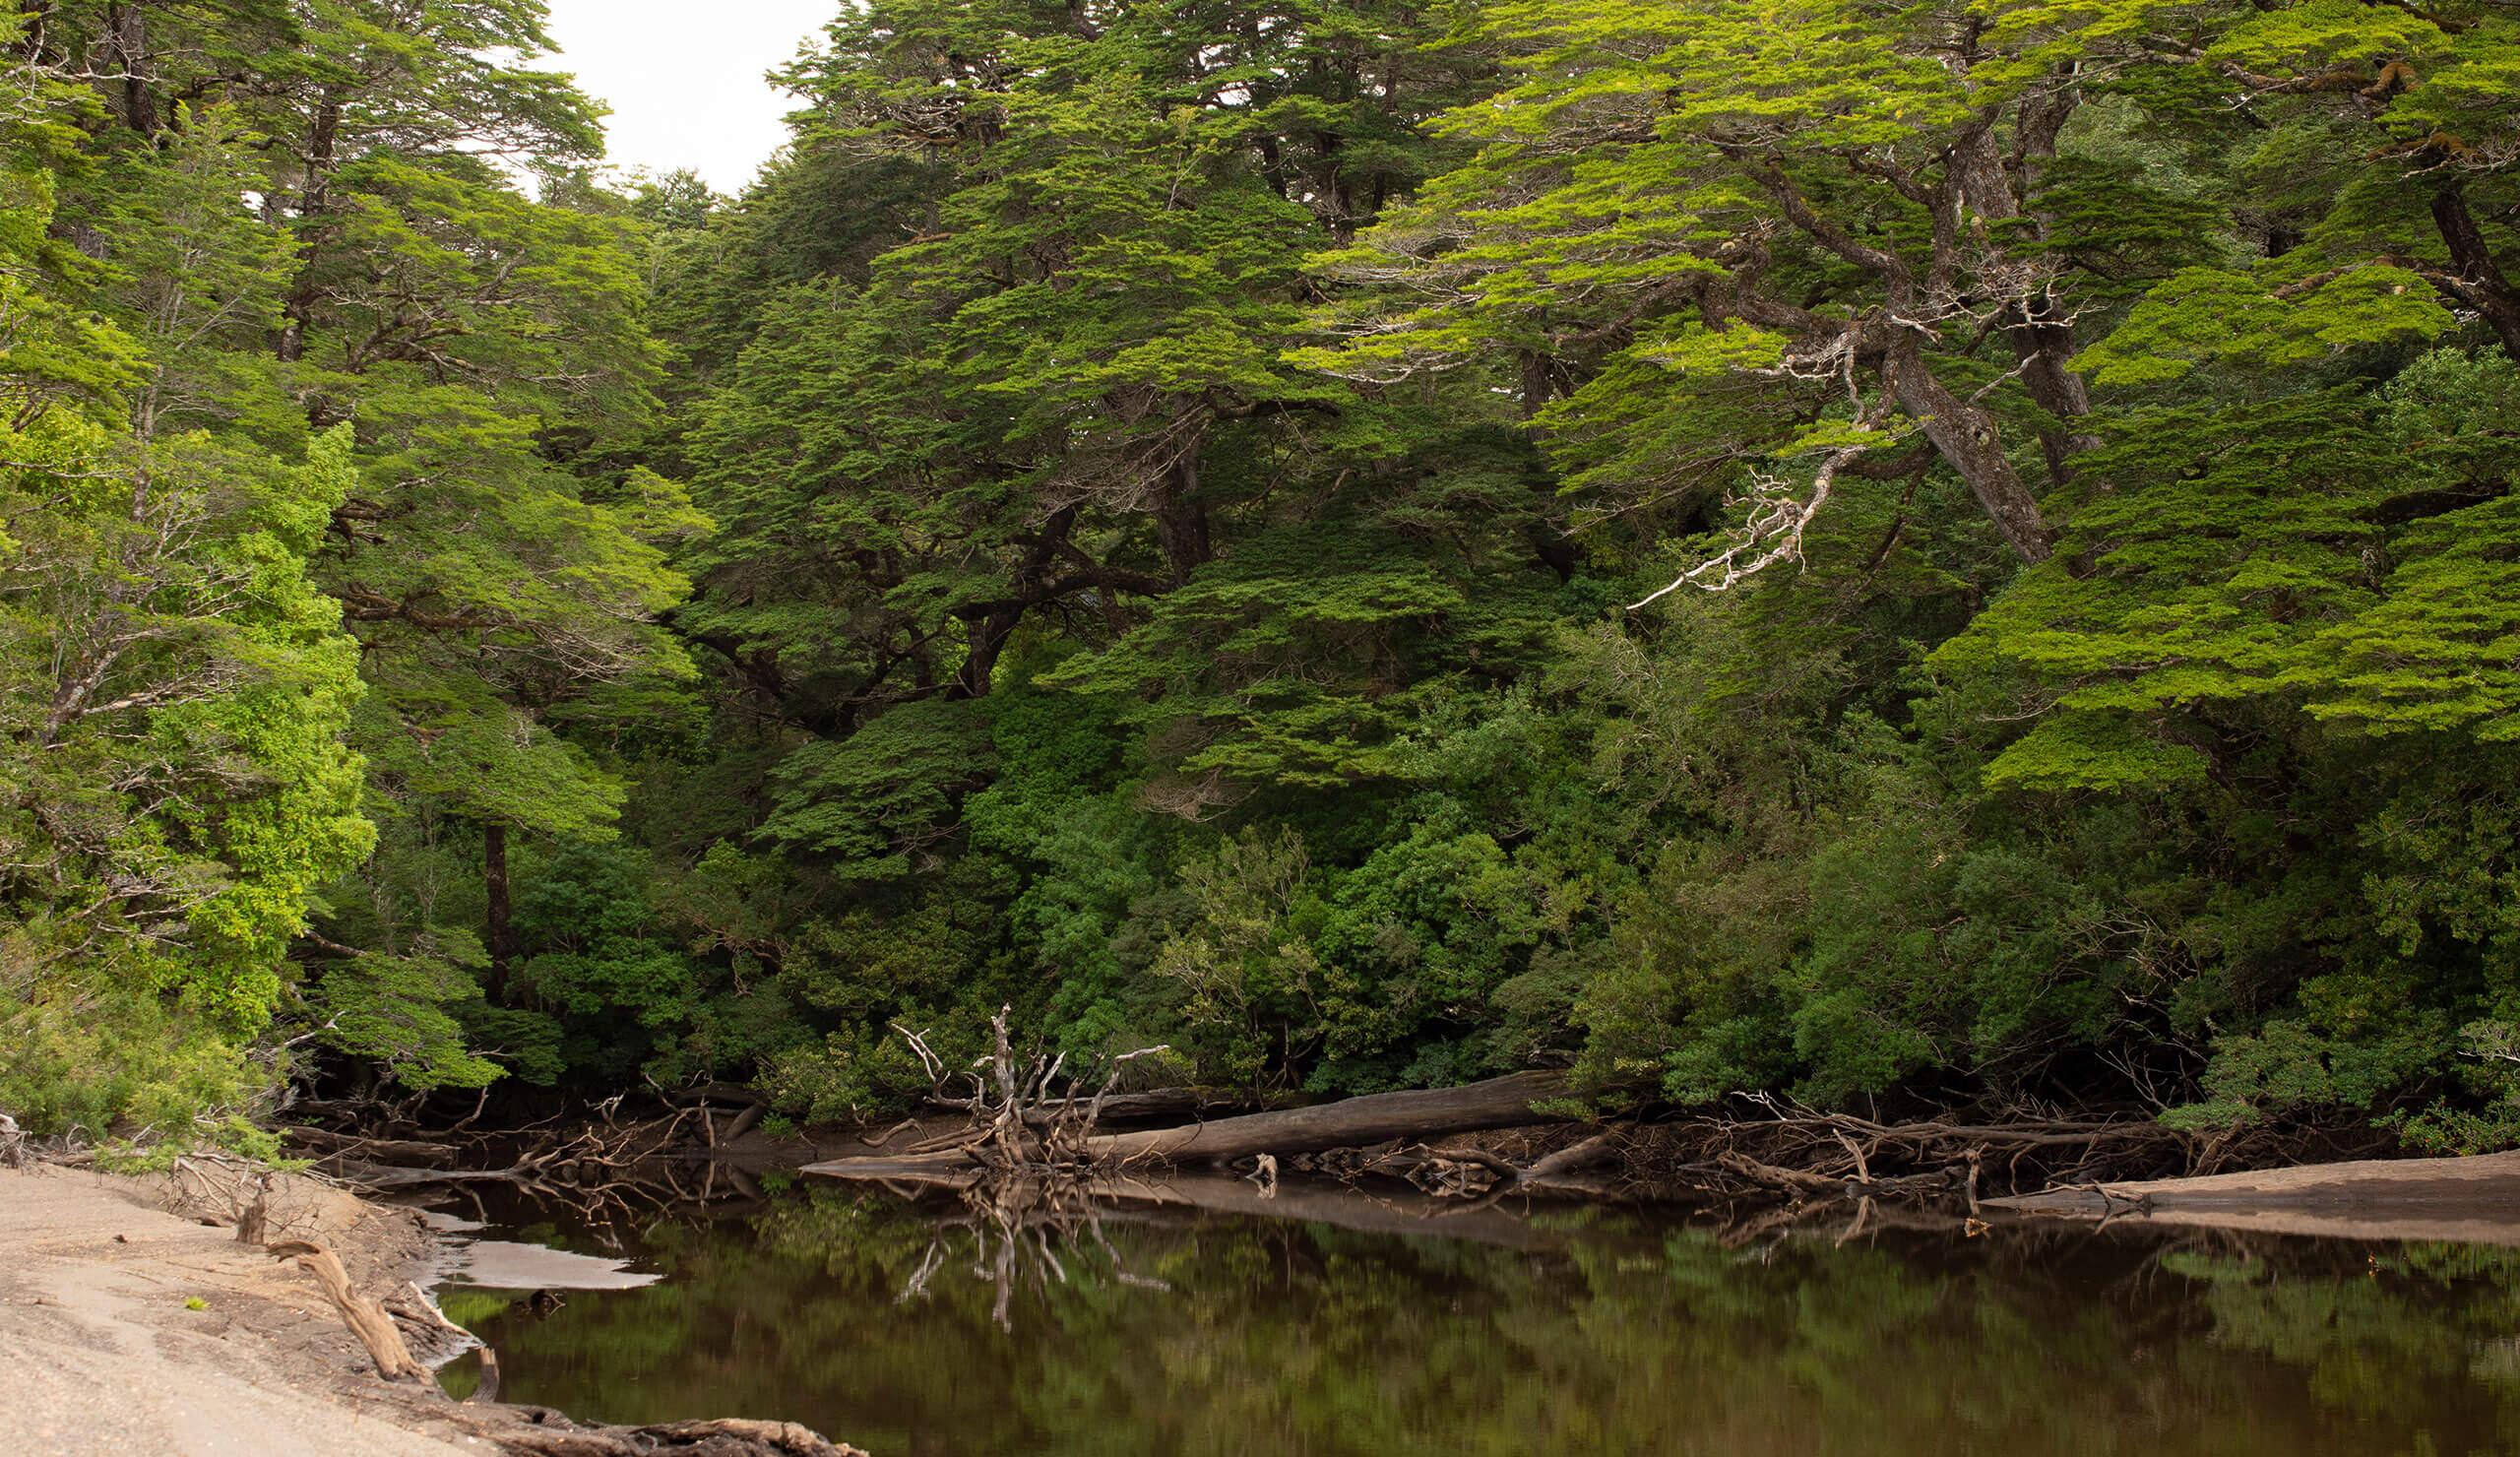 Humid temperate rainforest